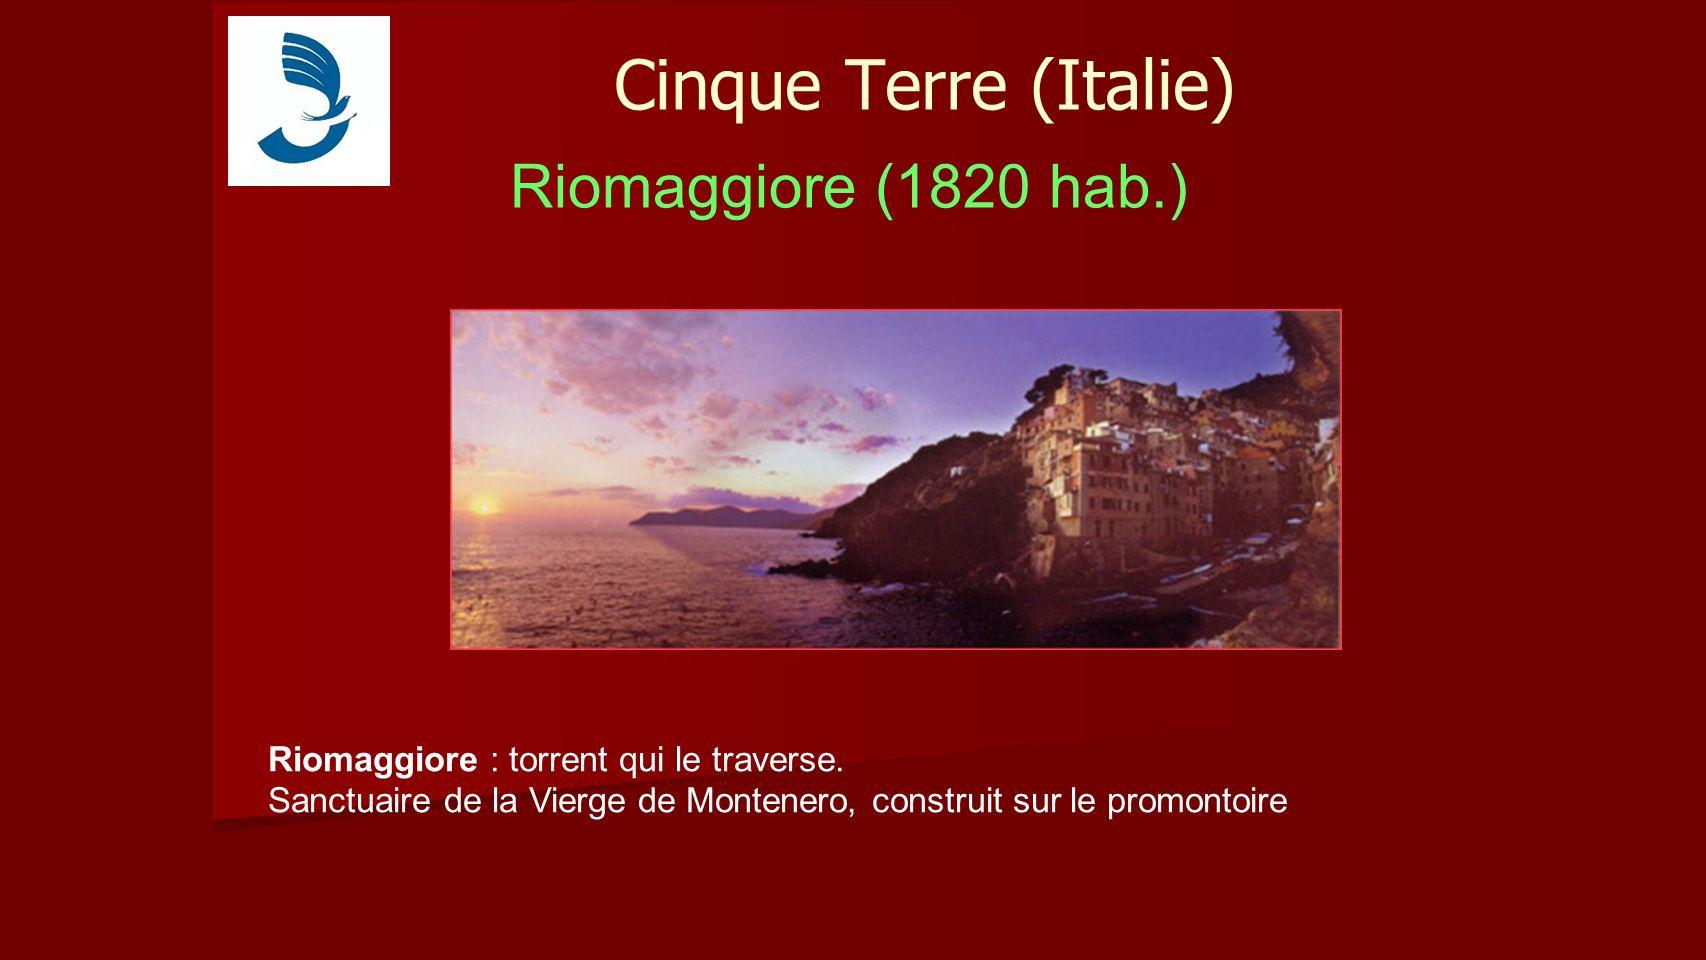 Cinque Terre (Italie) Riomaggiore (1820 hab.) Riomaggiore : torrent qui le traverse.